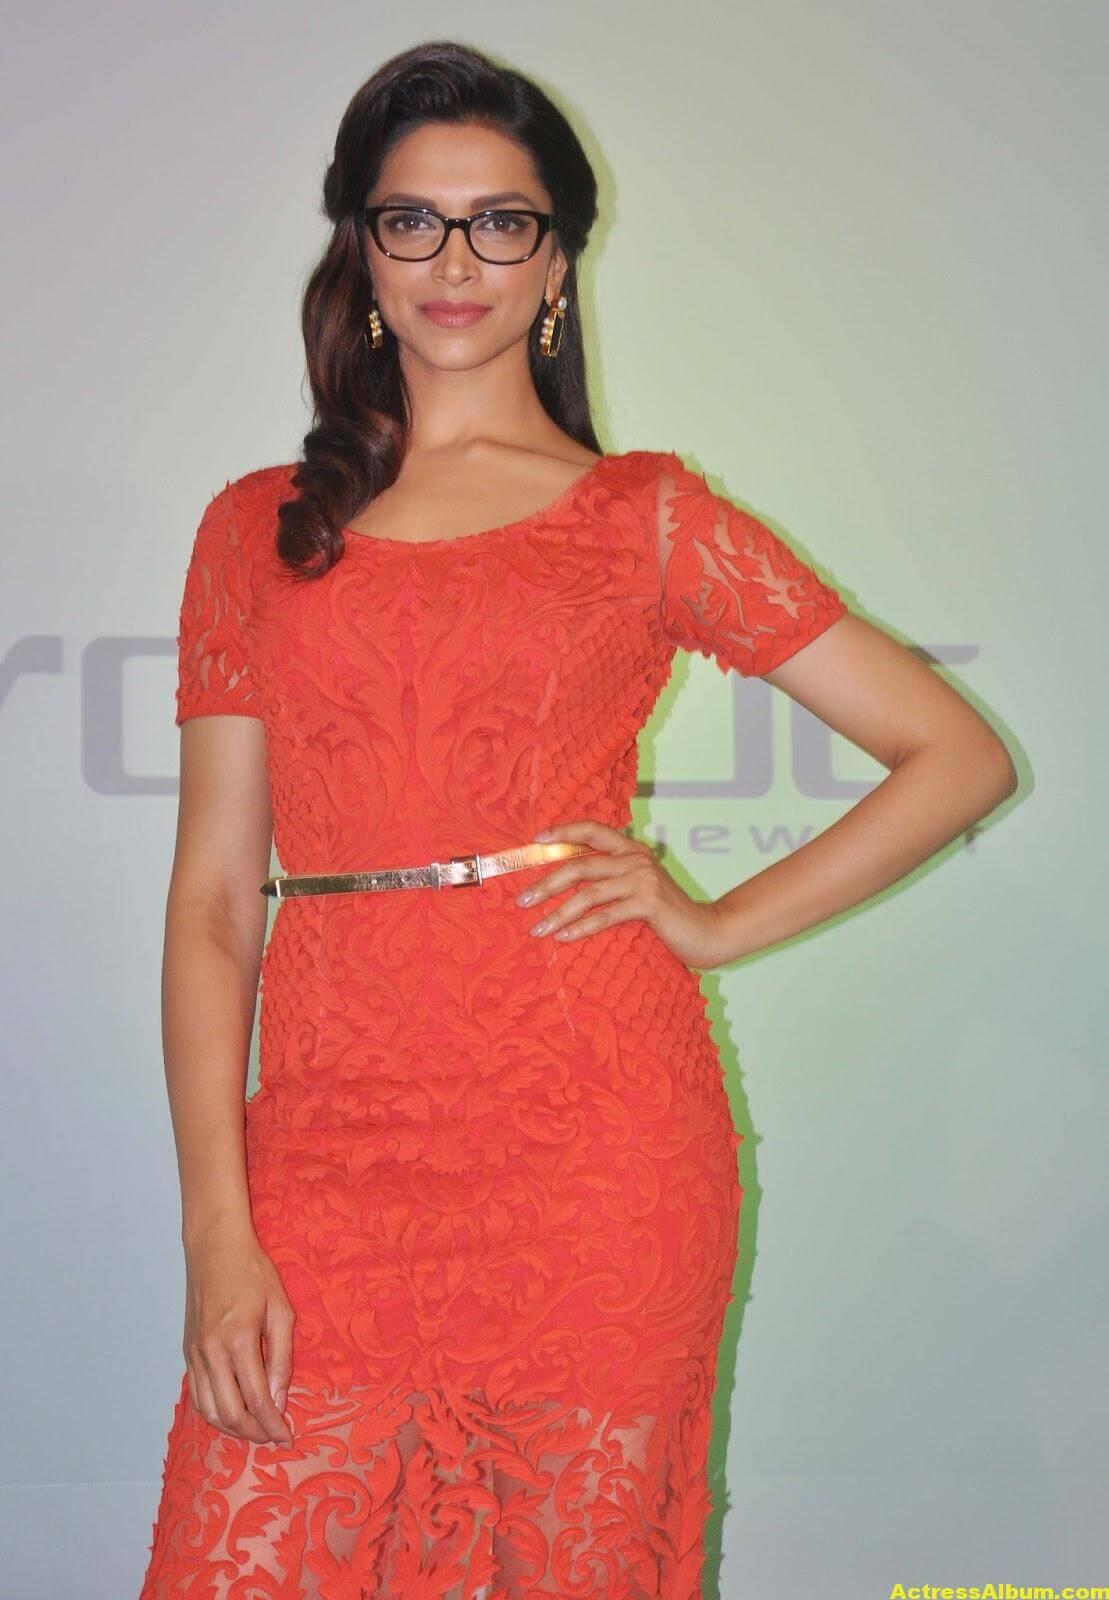 Deepika Padukone Photos In Orange Dress With Glass 2